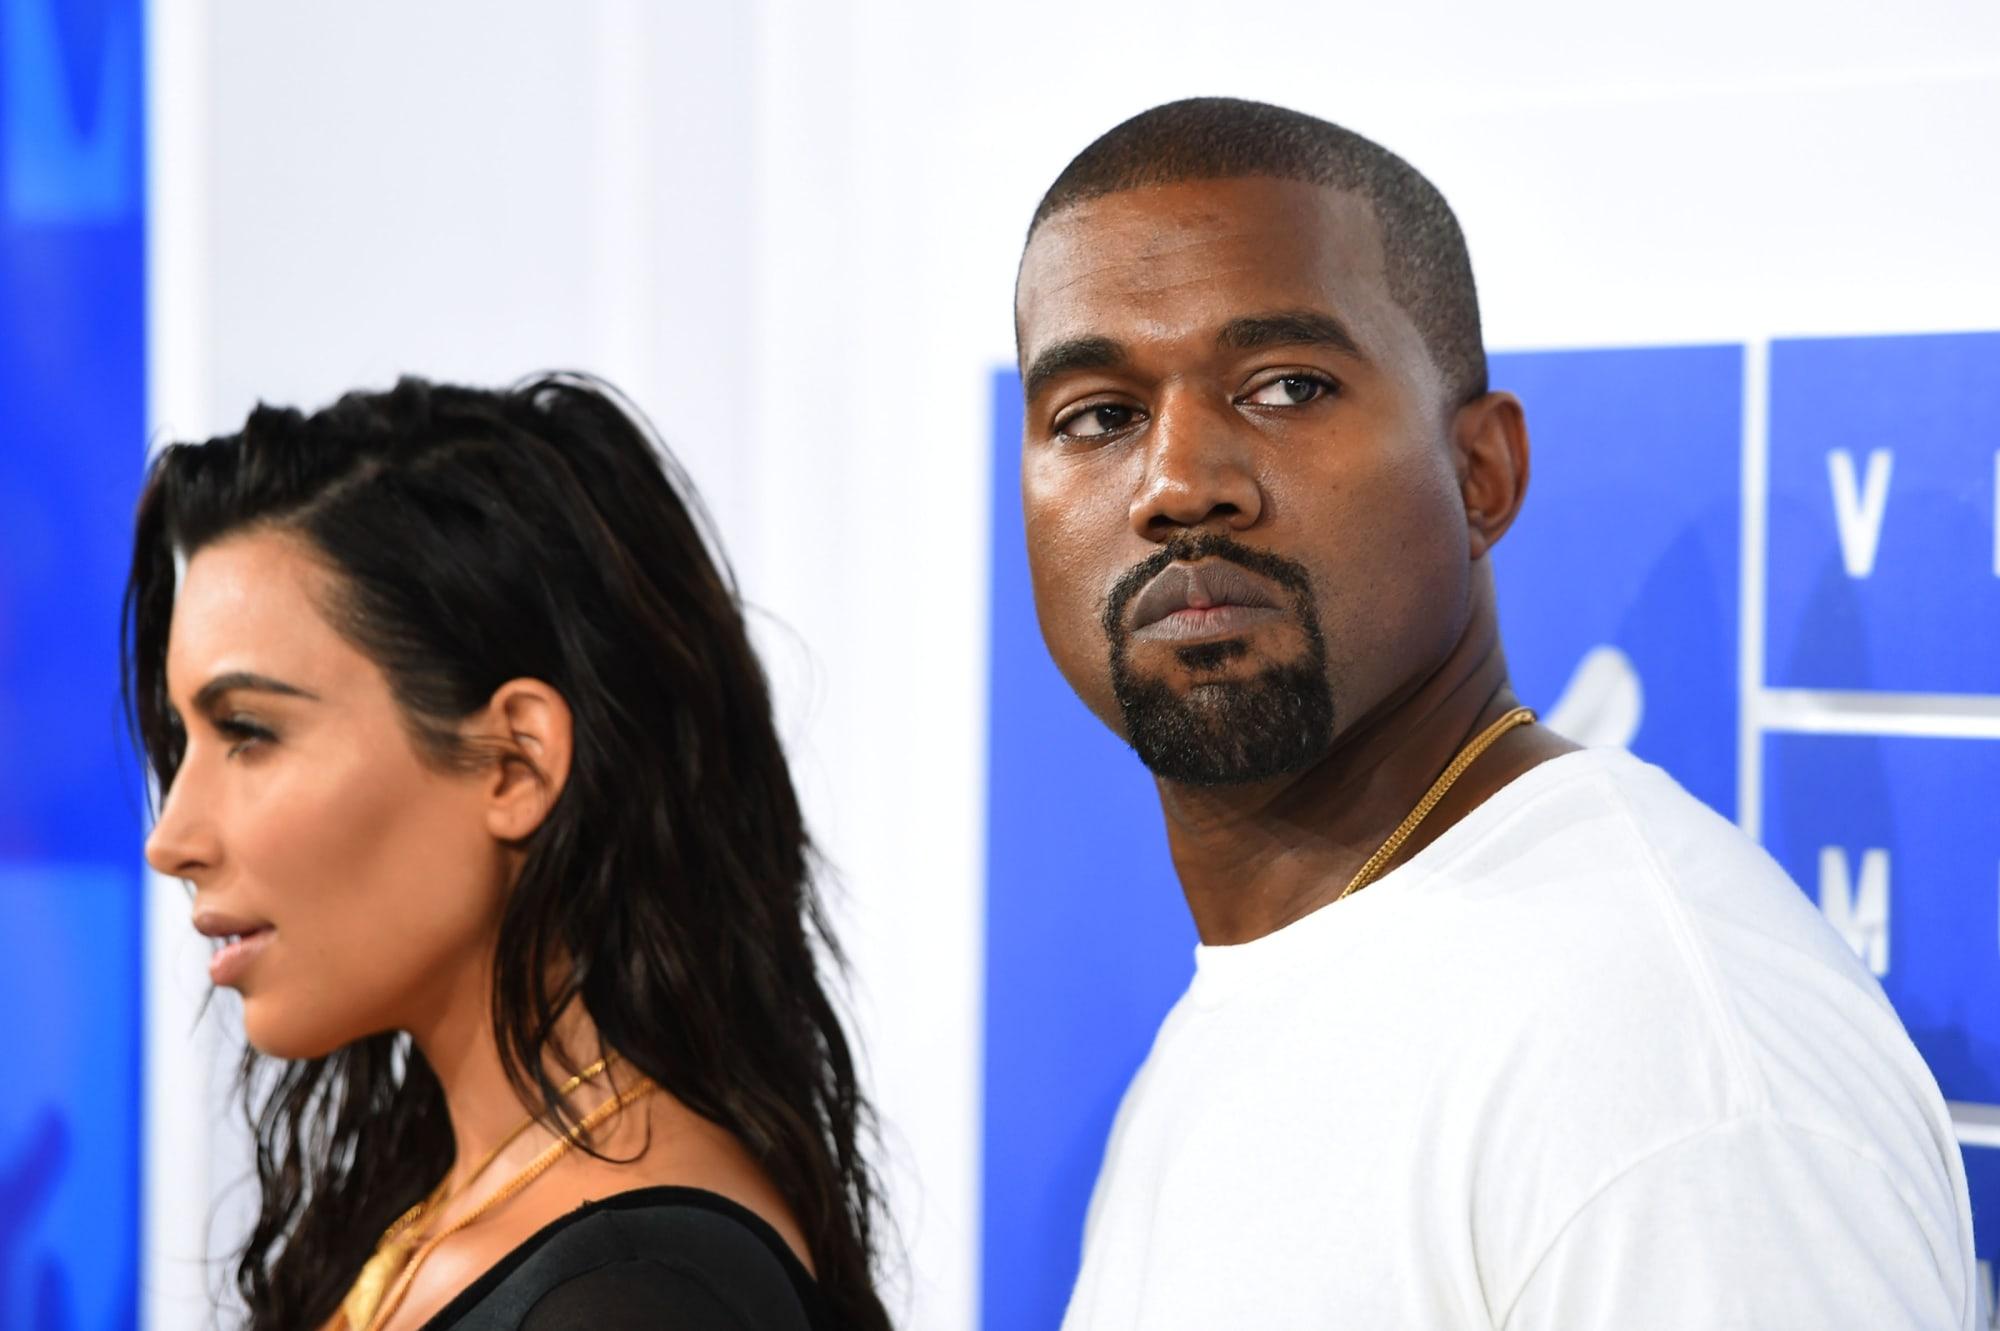 Kanye West officially unfollows Kim Kardashian on Instagram